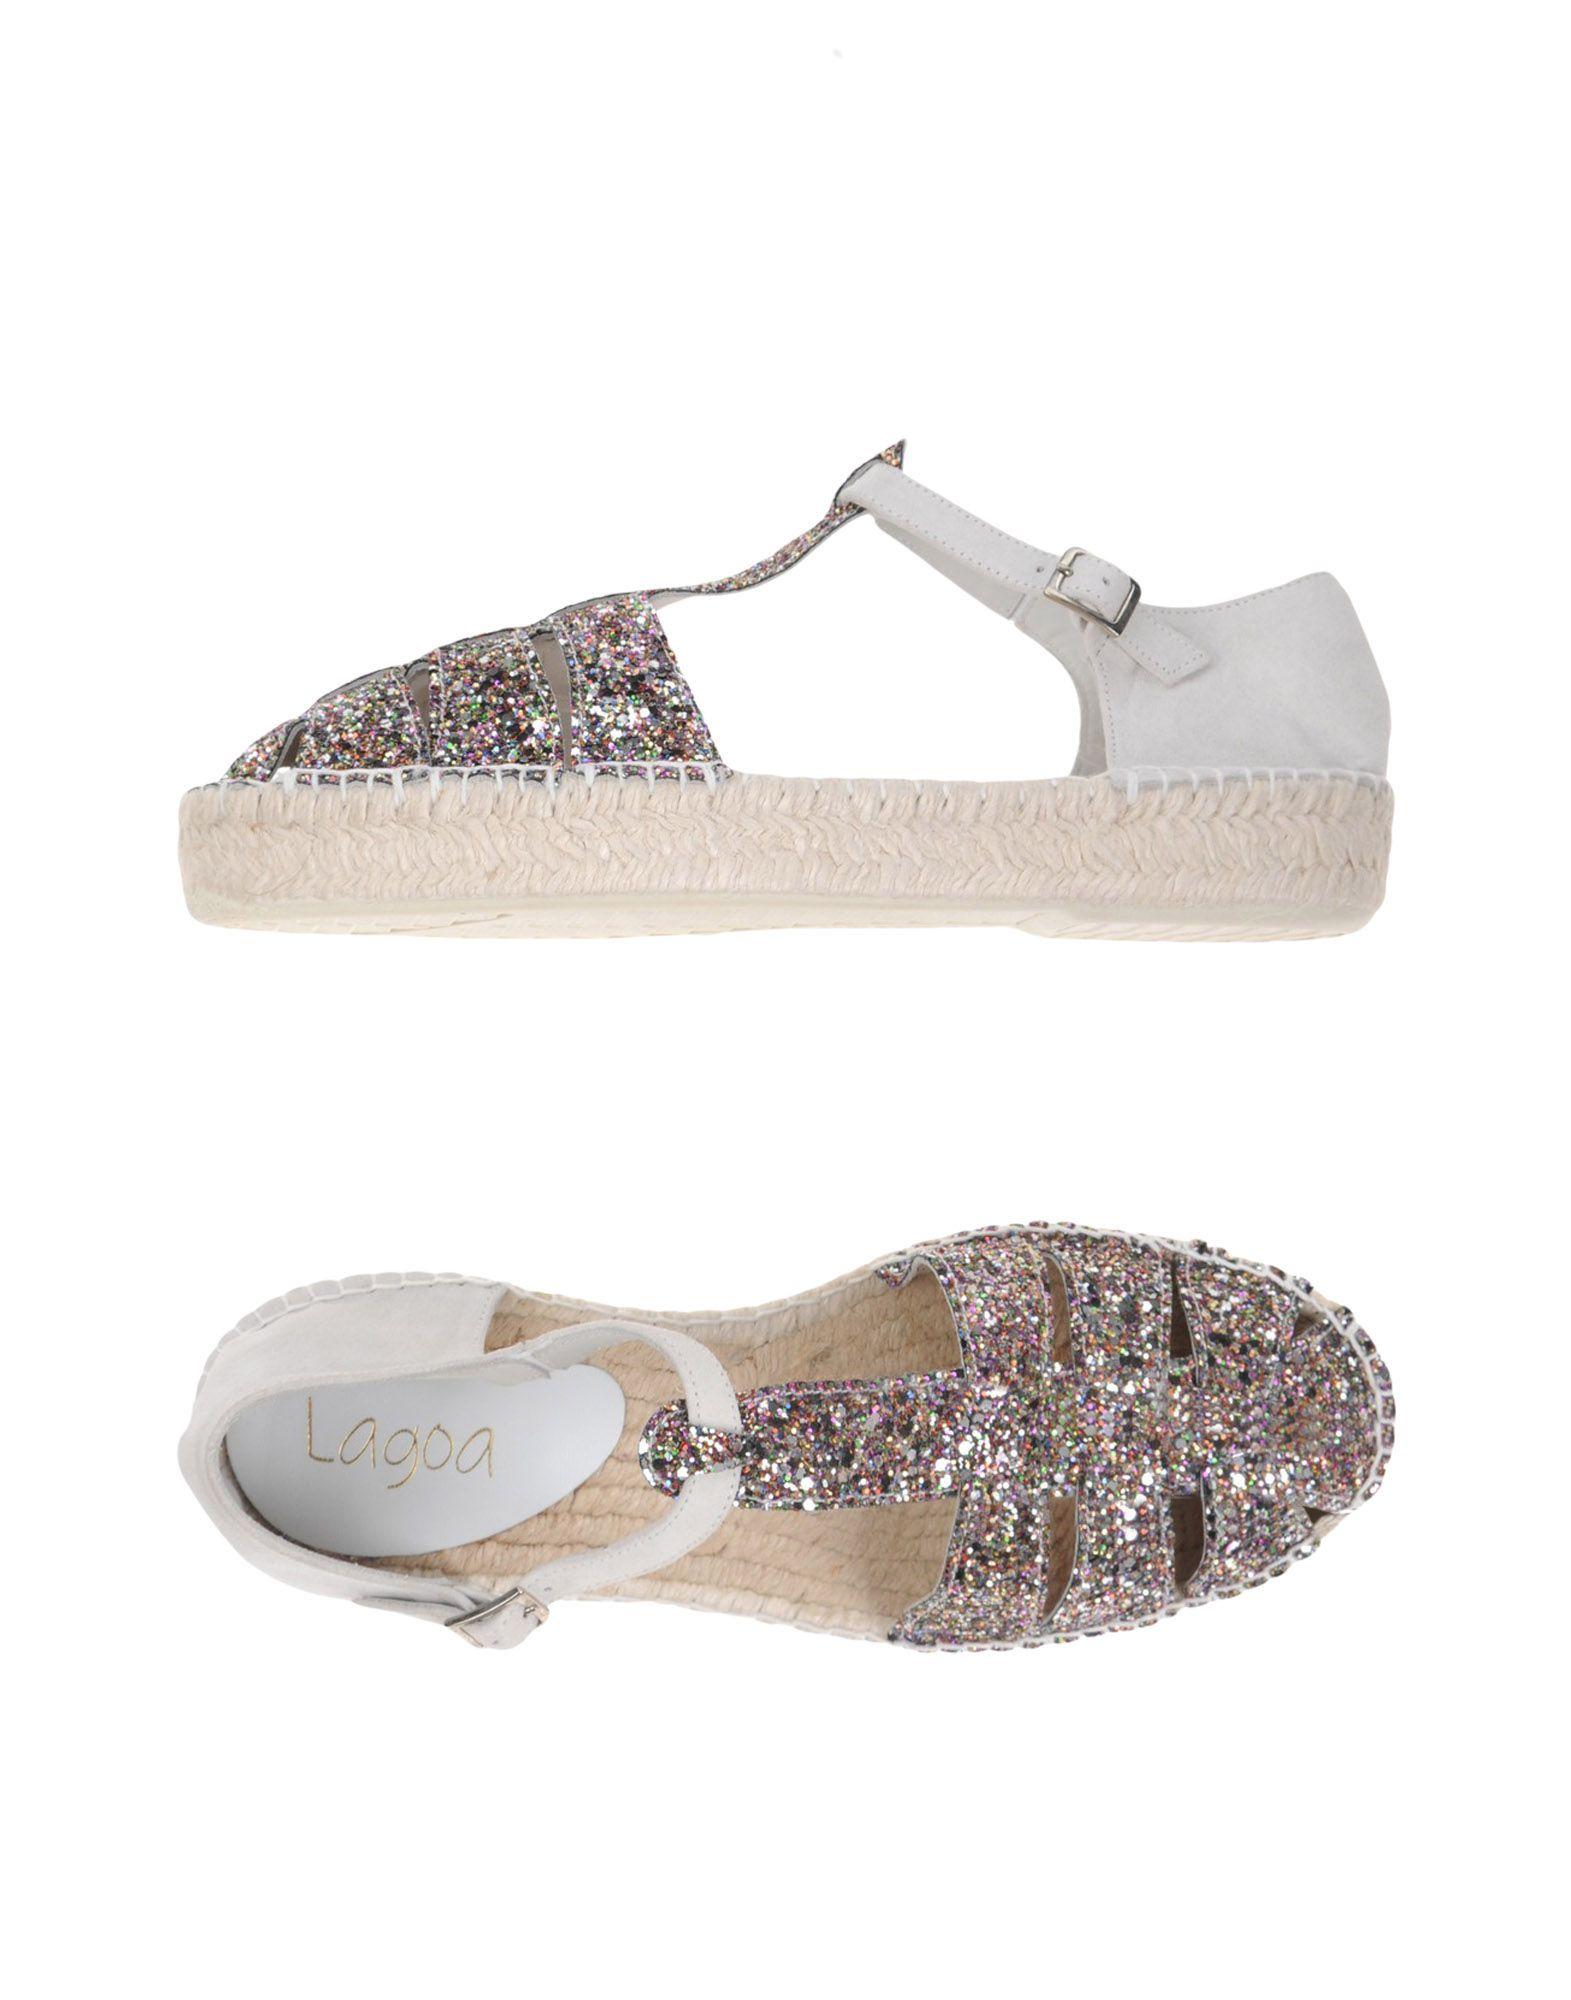 Lagoa Espadrilles Damen  11383054SR Gute Qualität beliebte Schuhe